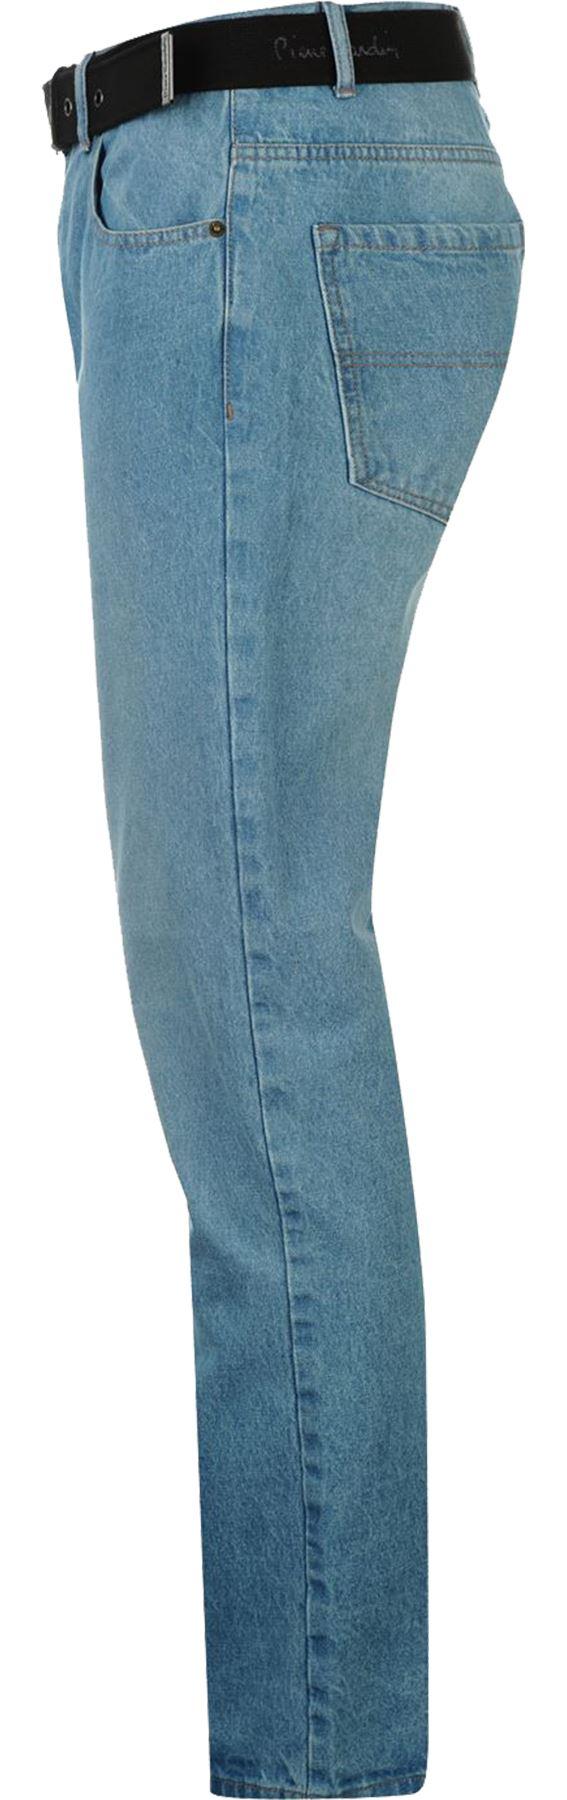 Mens-Belted-Denim-Jeans-Straight-Leg-Regular-Fit-Pierre-Cardin-Pants-Big-Tall thumbnail 11